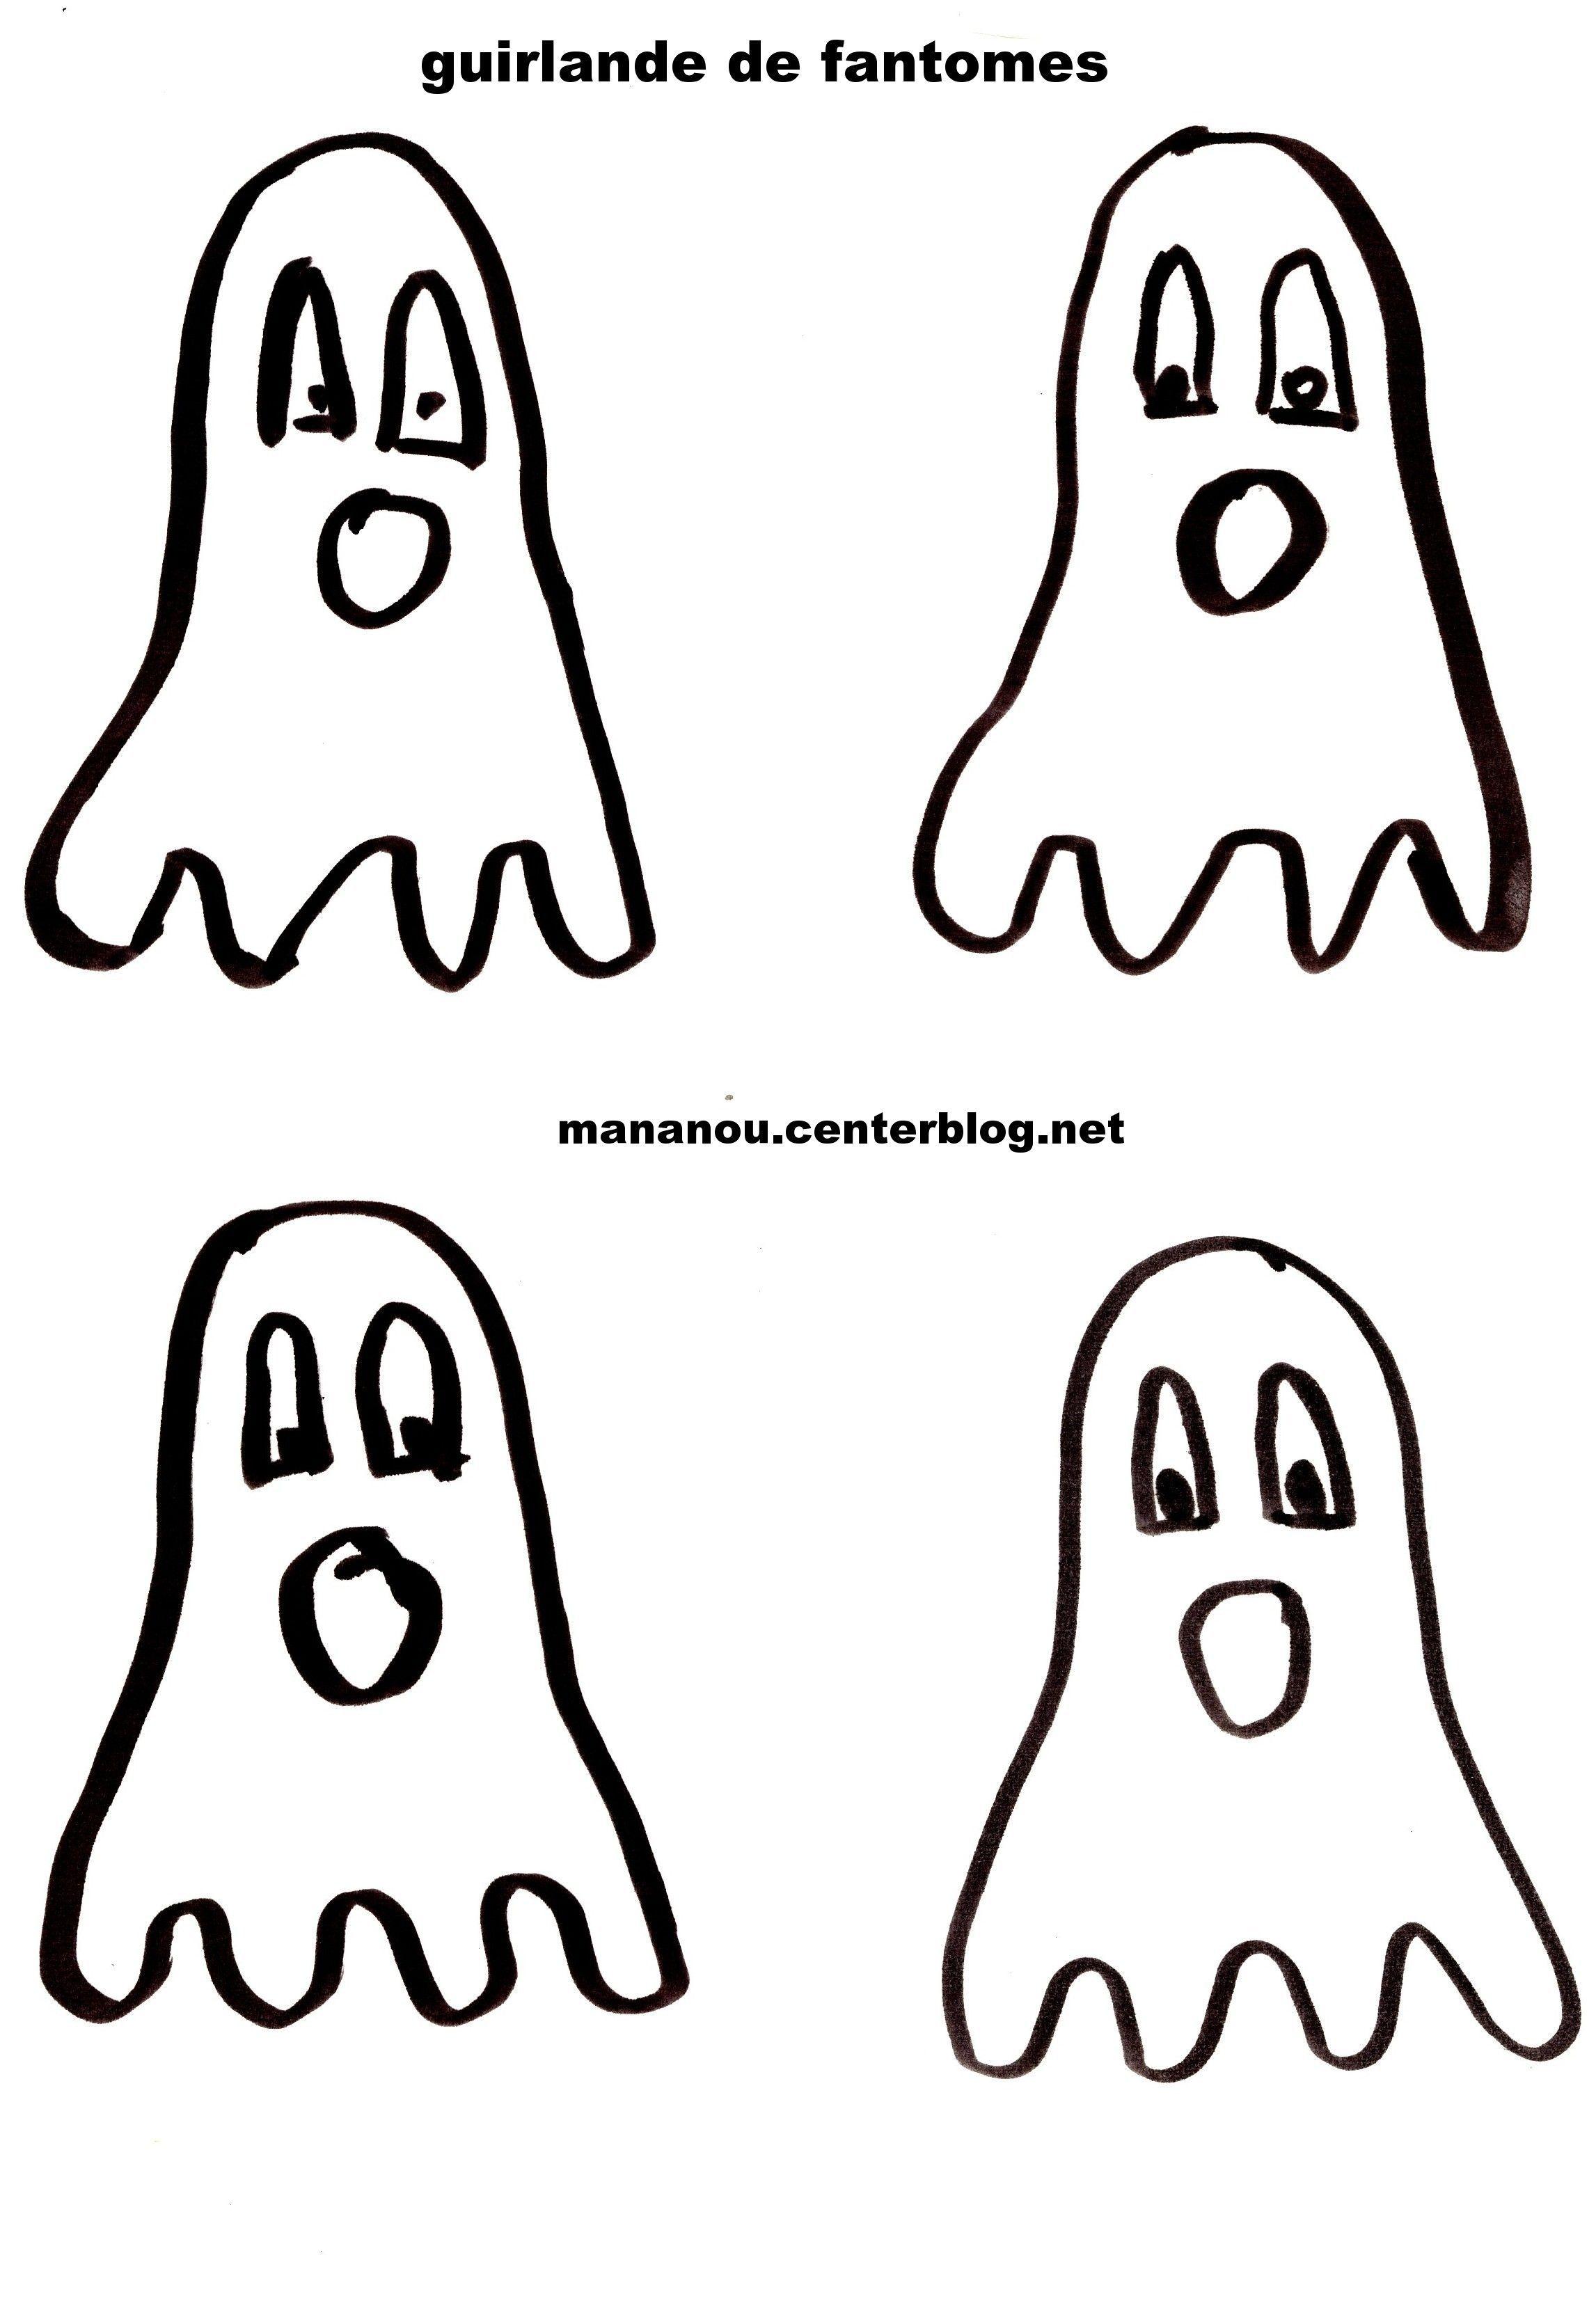 Gabarit guirlande halloween - Guirlande halloween a imprimer ...